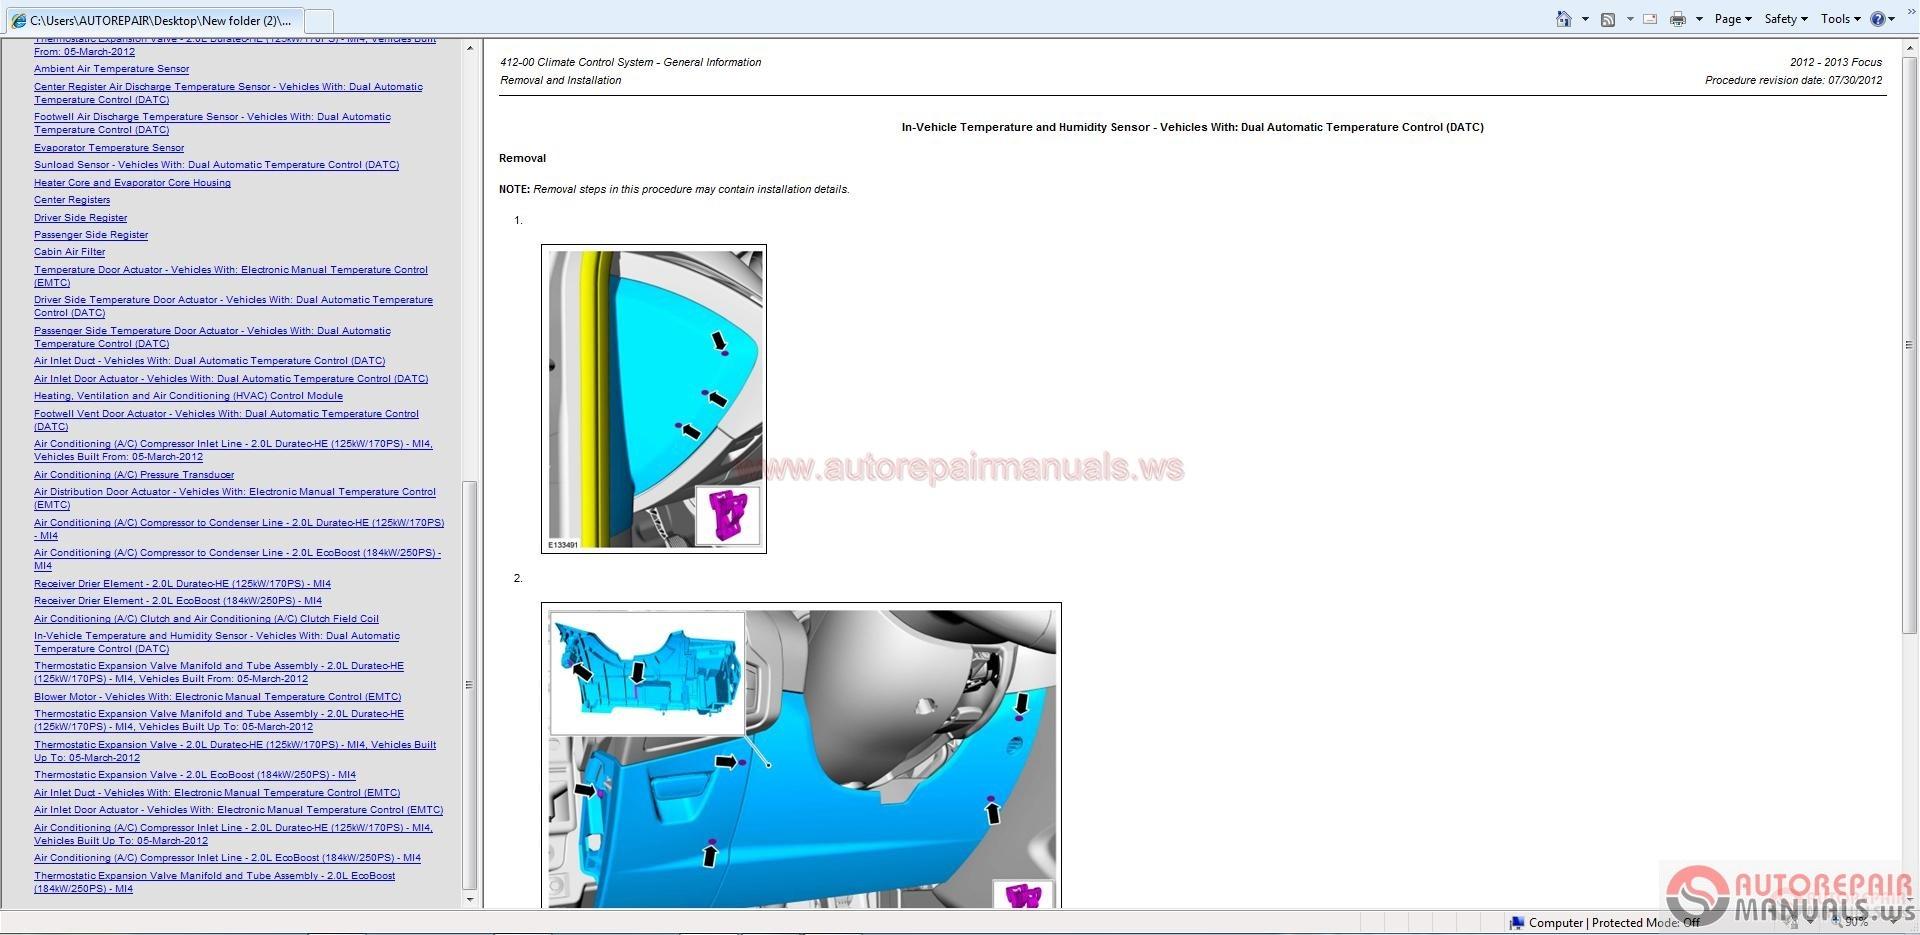 Ford Focus 2012-2013 Workshop Manual